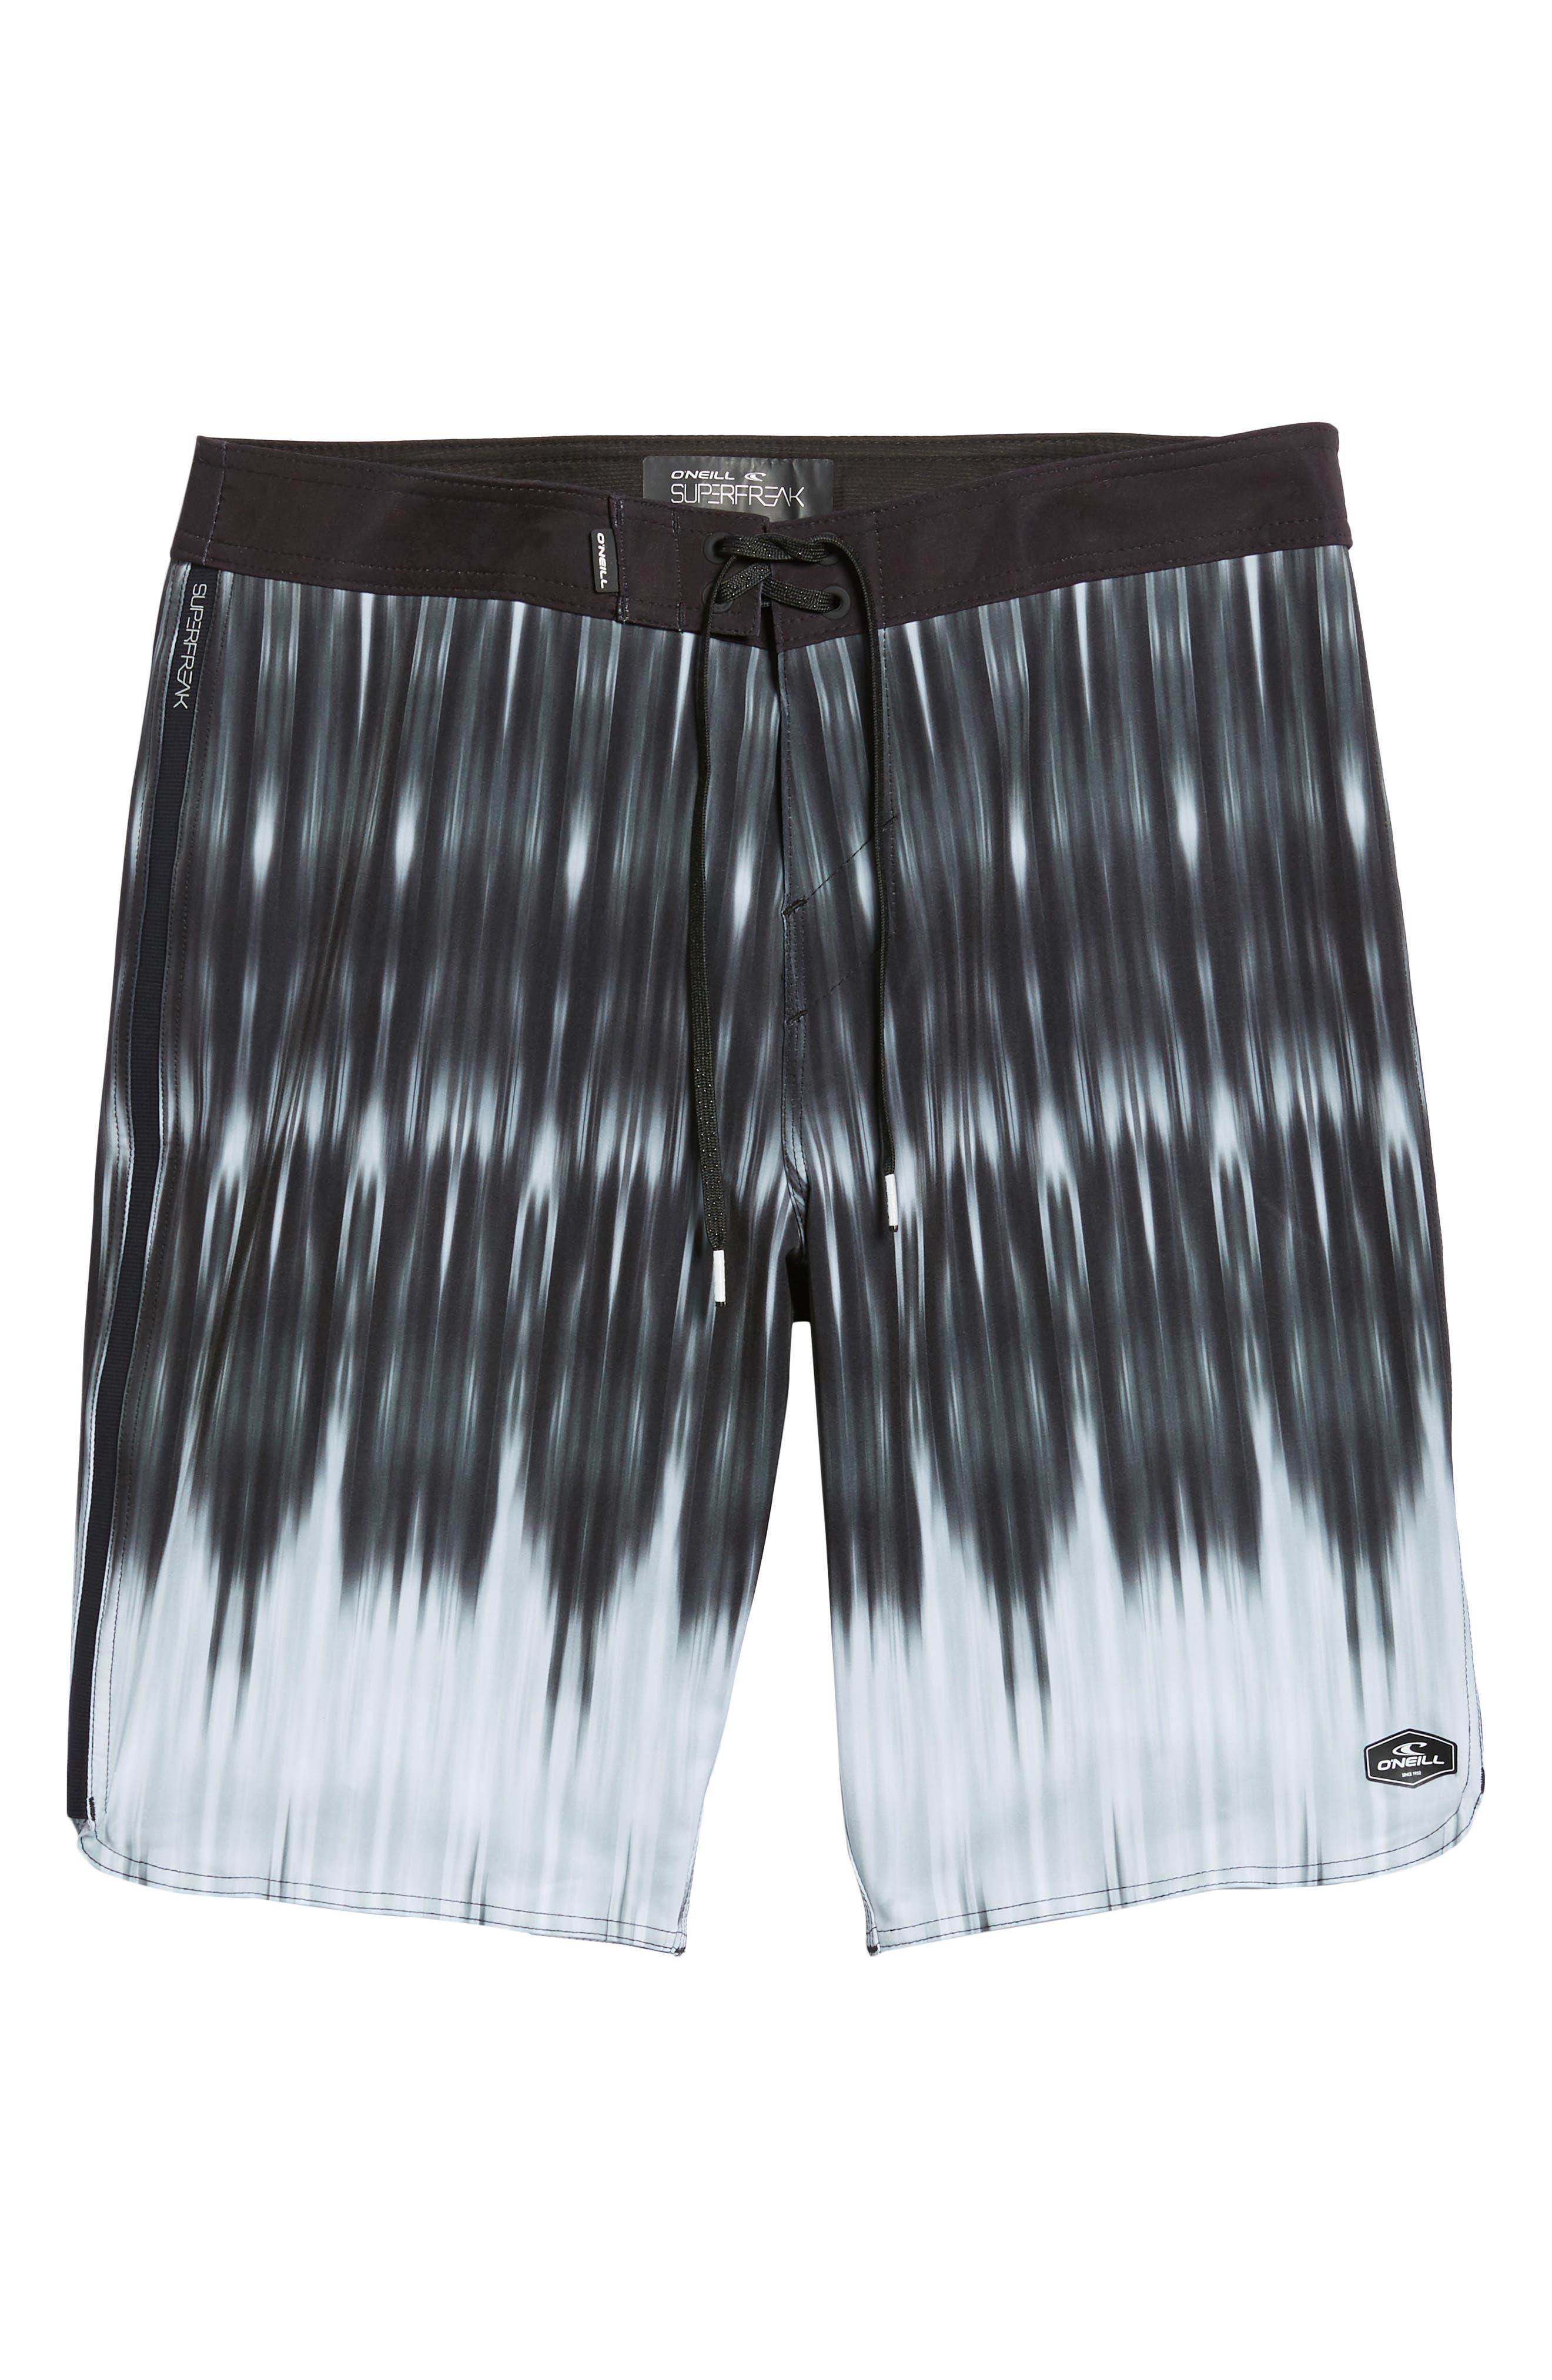 Superfreak Dimension Board Shorts,                             Alternate thumbnail 6, color,                             Black